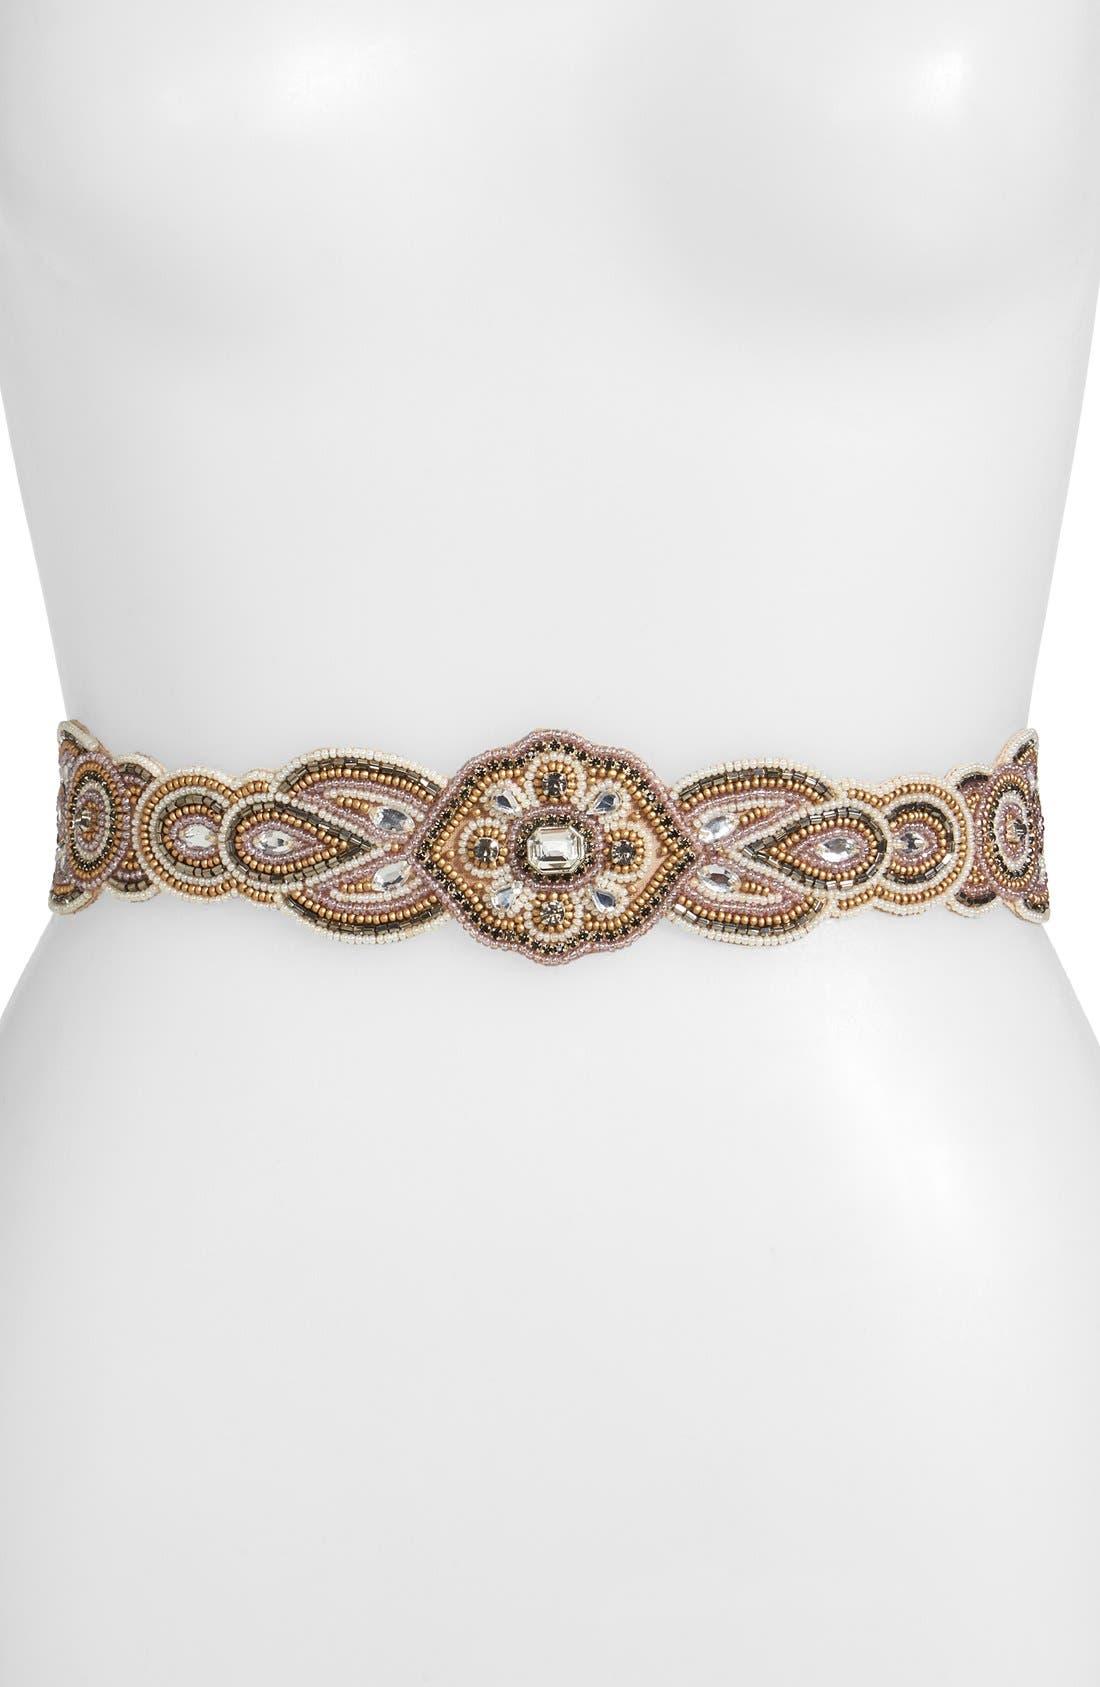 Alternate Image 1 Selected - Glint 'Aeolian' Beaded Stretch Belt